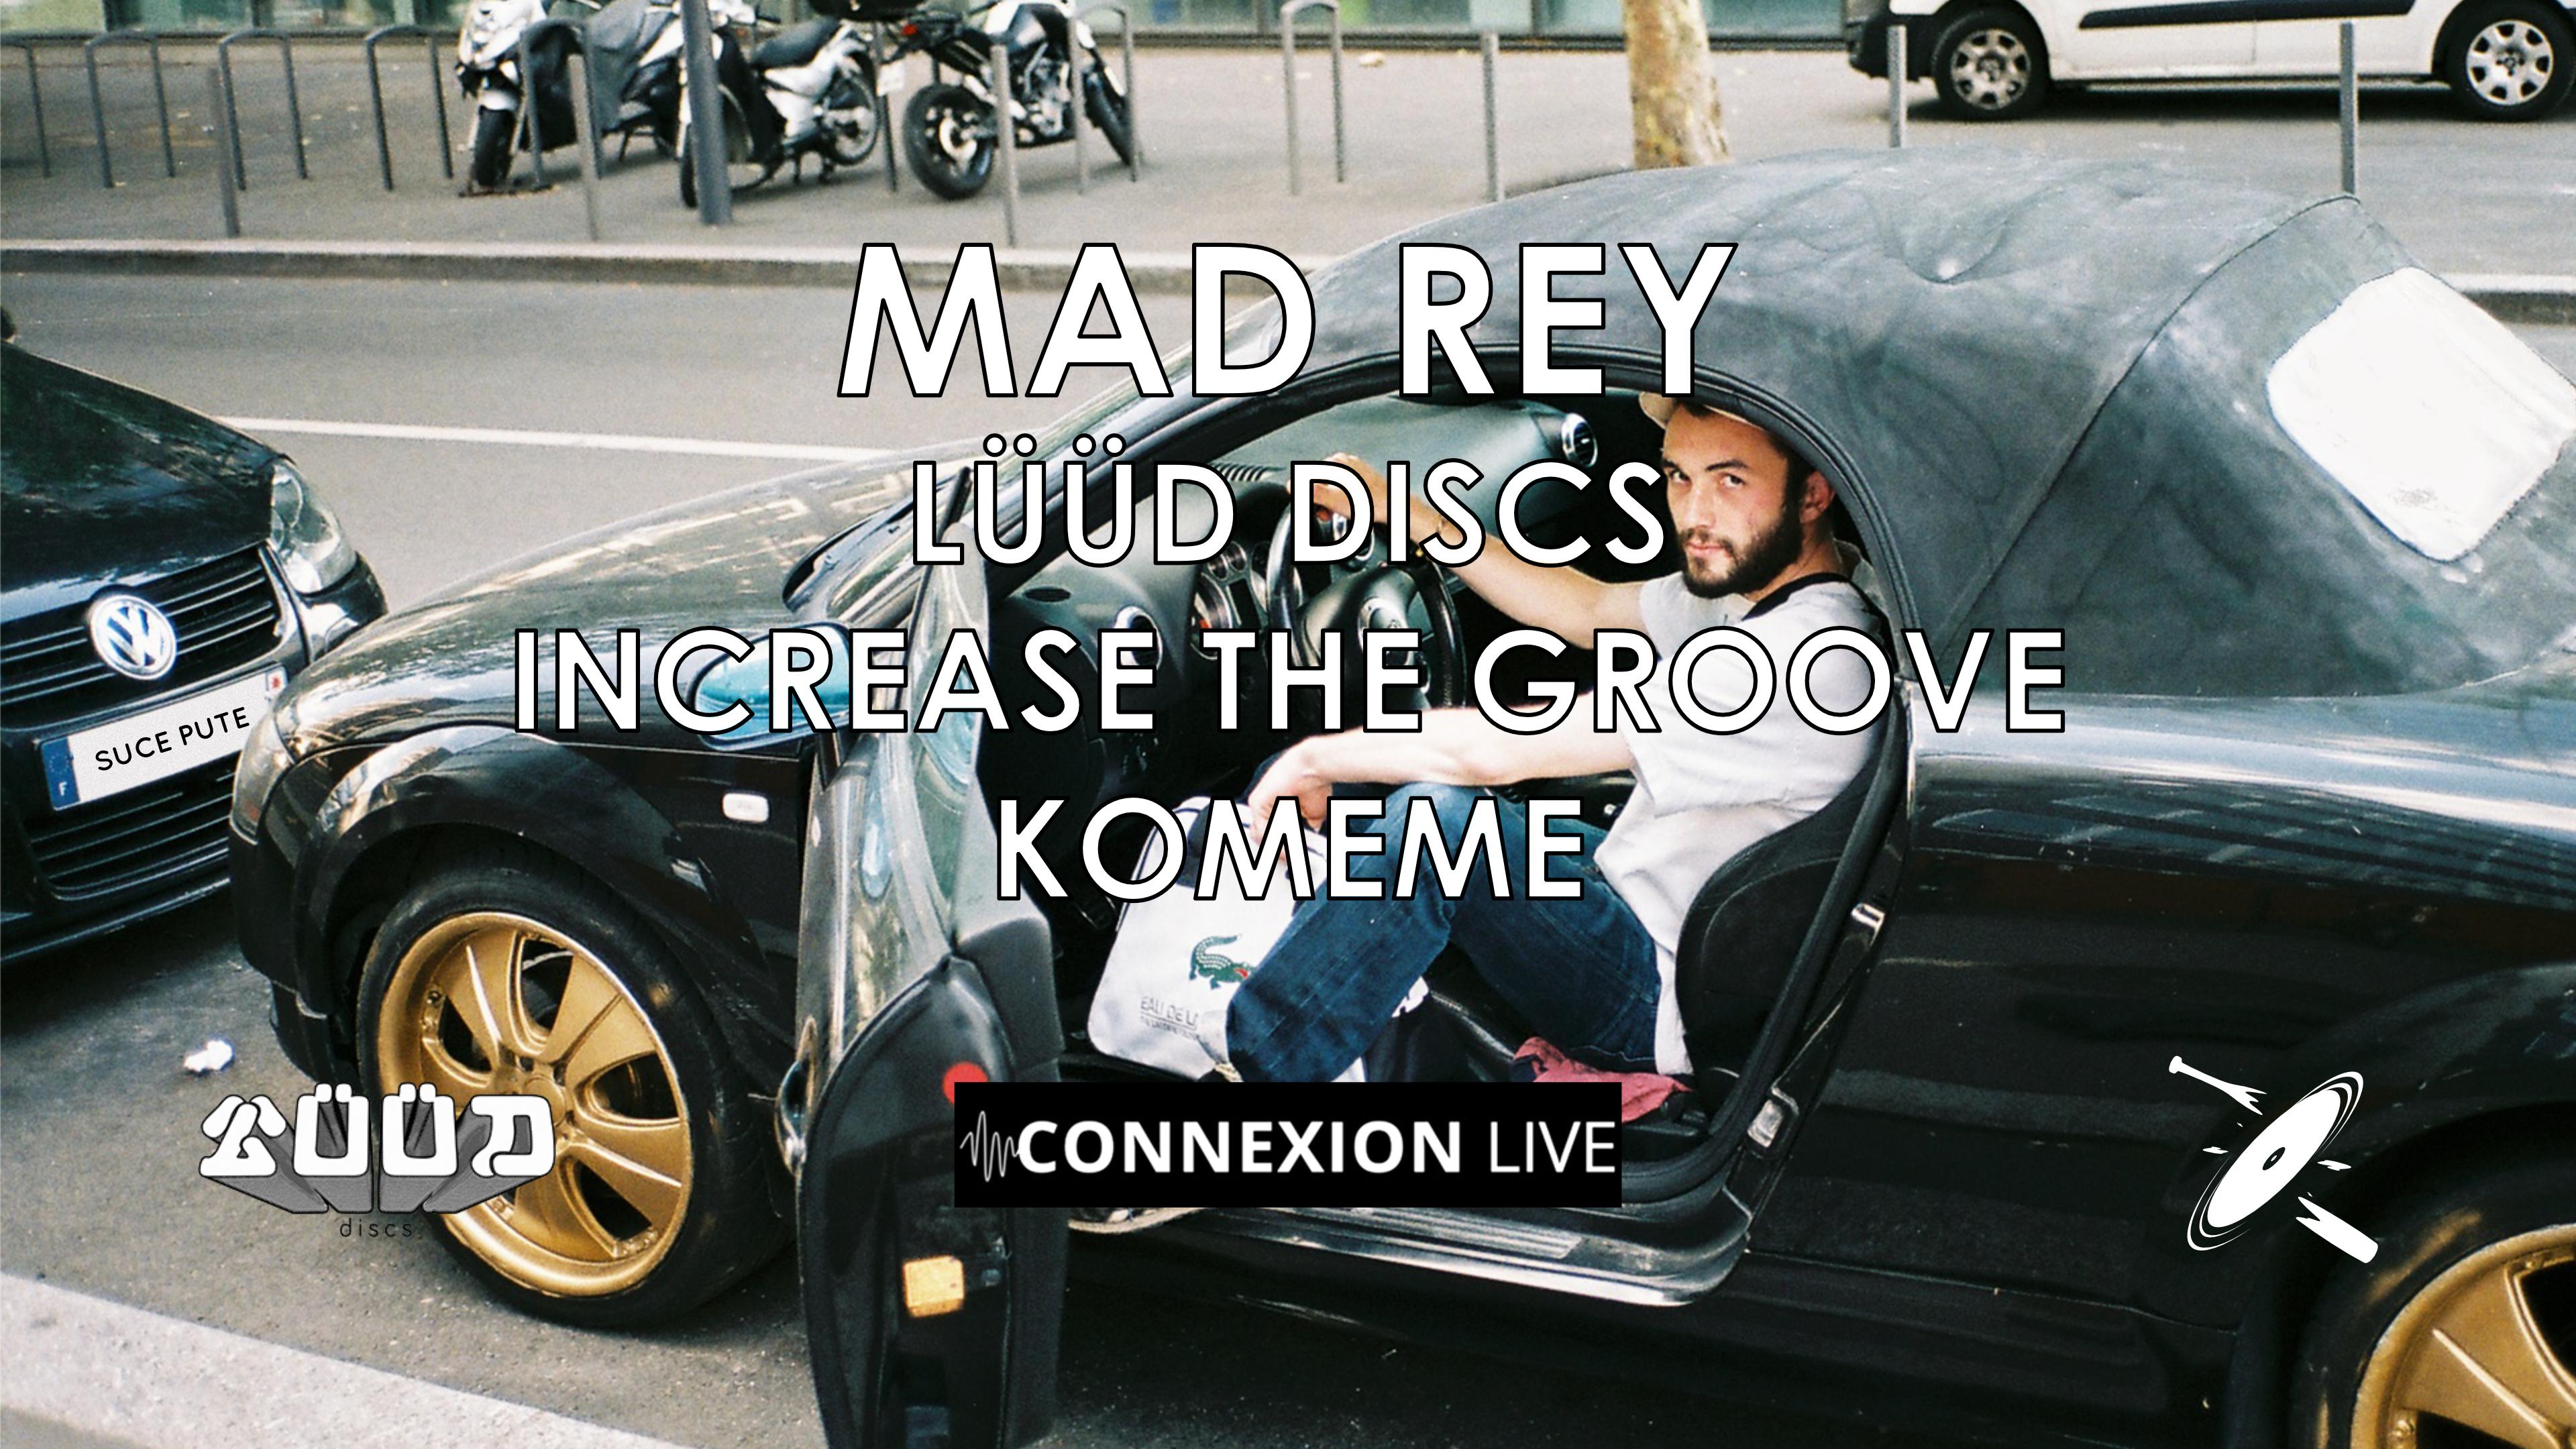 Increase the Groove & Lüüd Discs w/ MAD REY, Komeme & friends